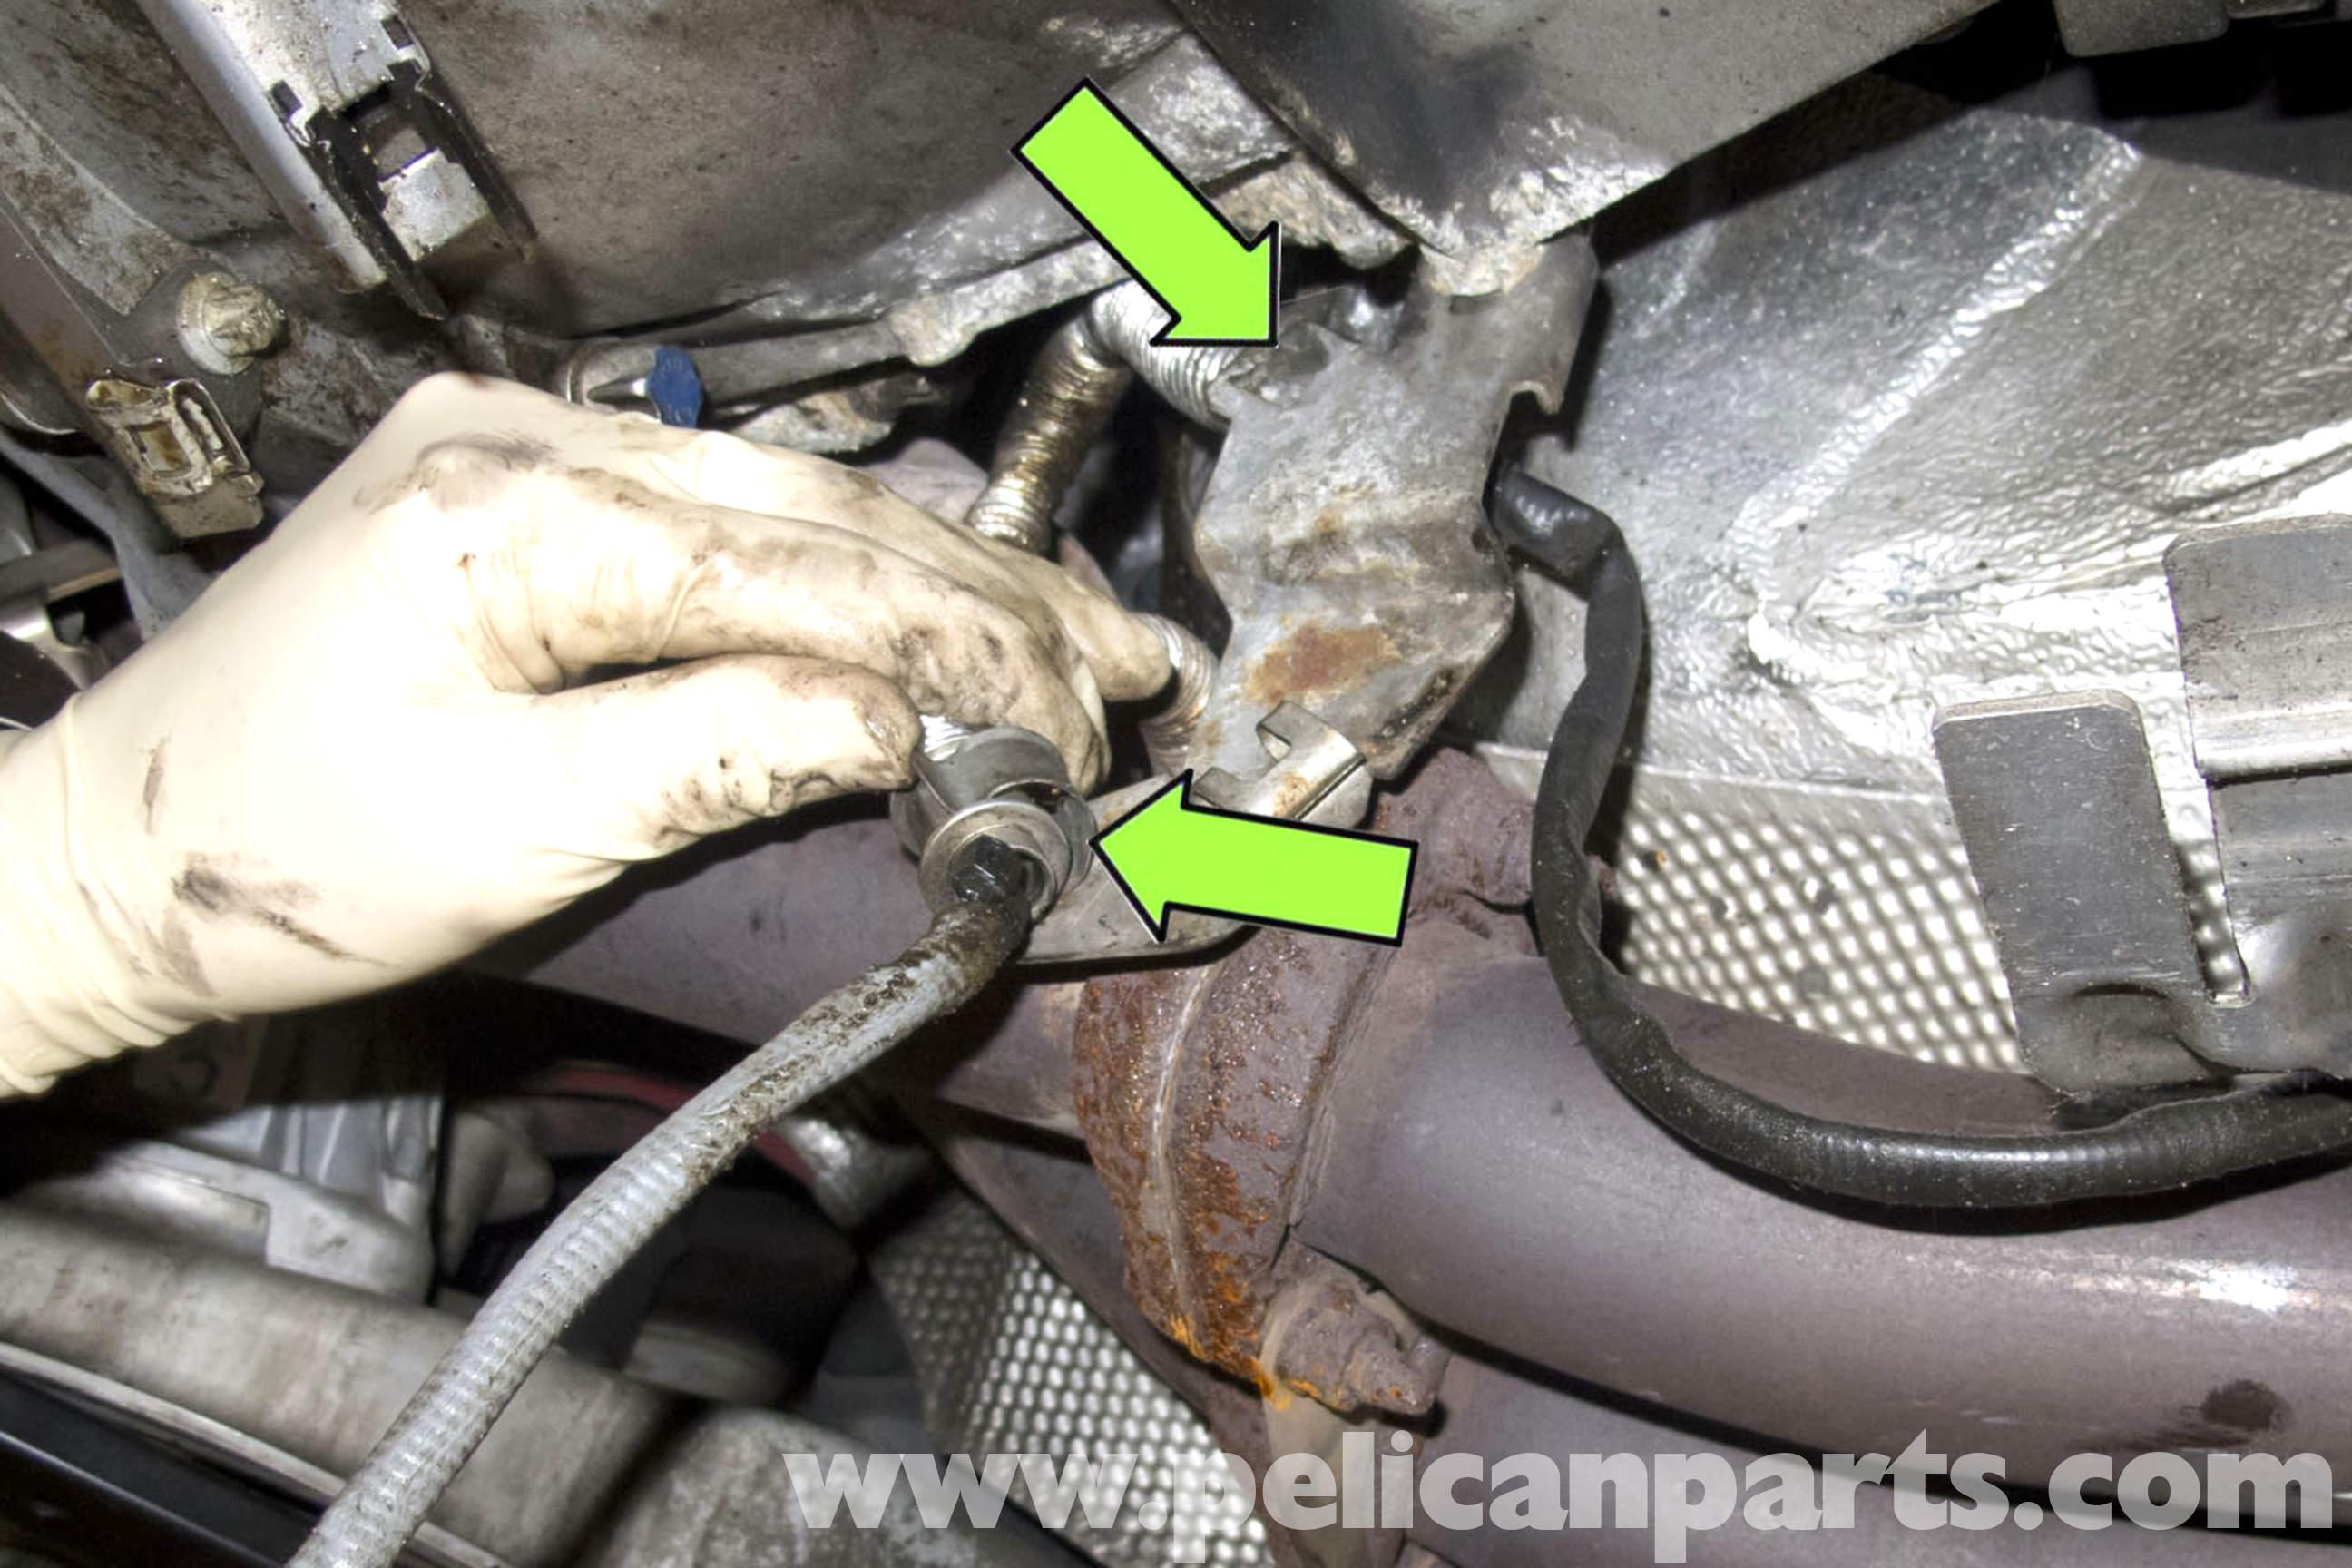 2009 Bmw 335i Transmission Mount Diagram Free Wiring For You E90 Fuse Box Clutch Replacement E91 E92 E93 Pelican Parts Diy Rh Pelicanparts Com Manual